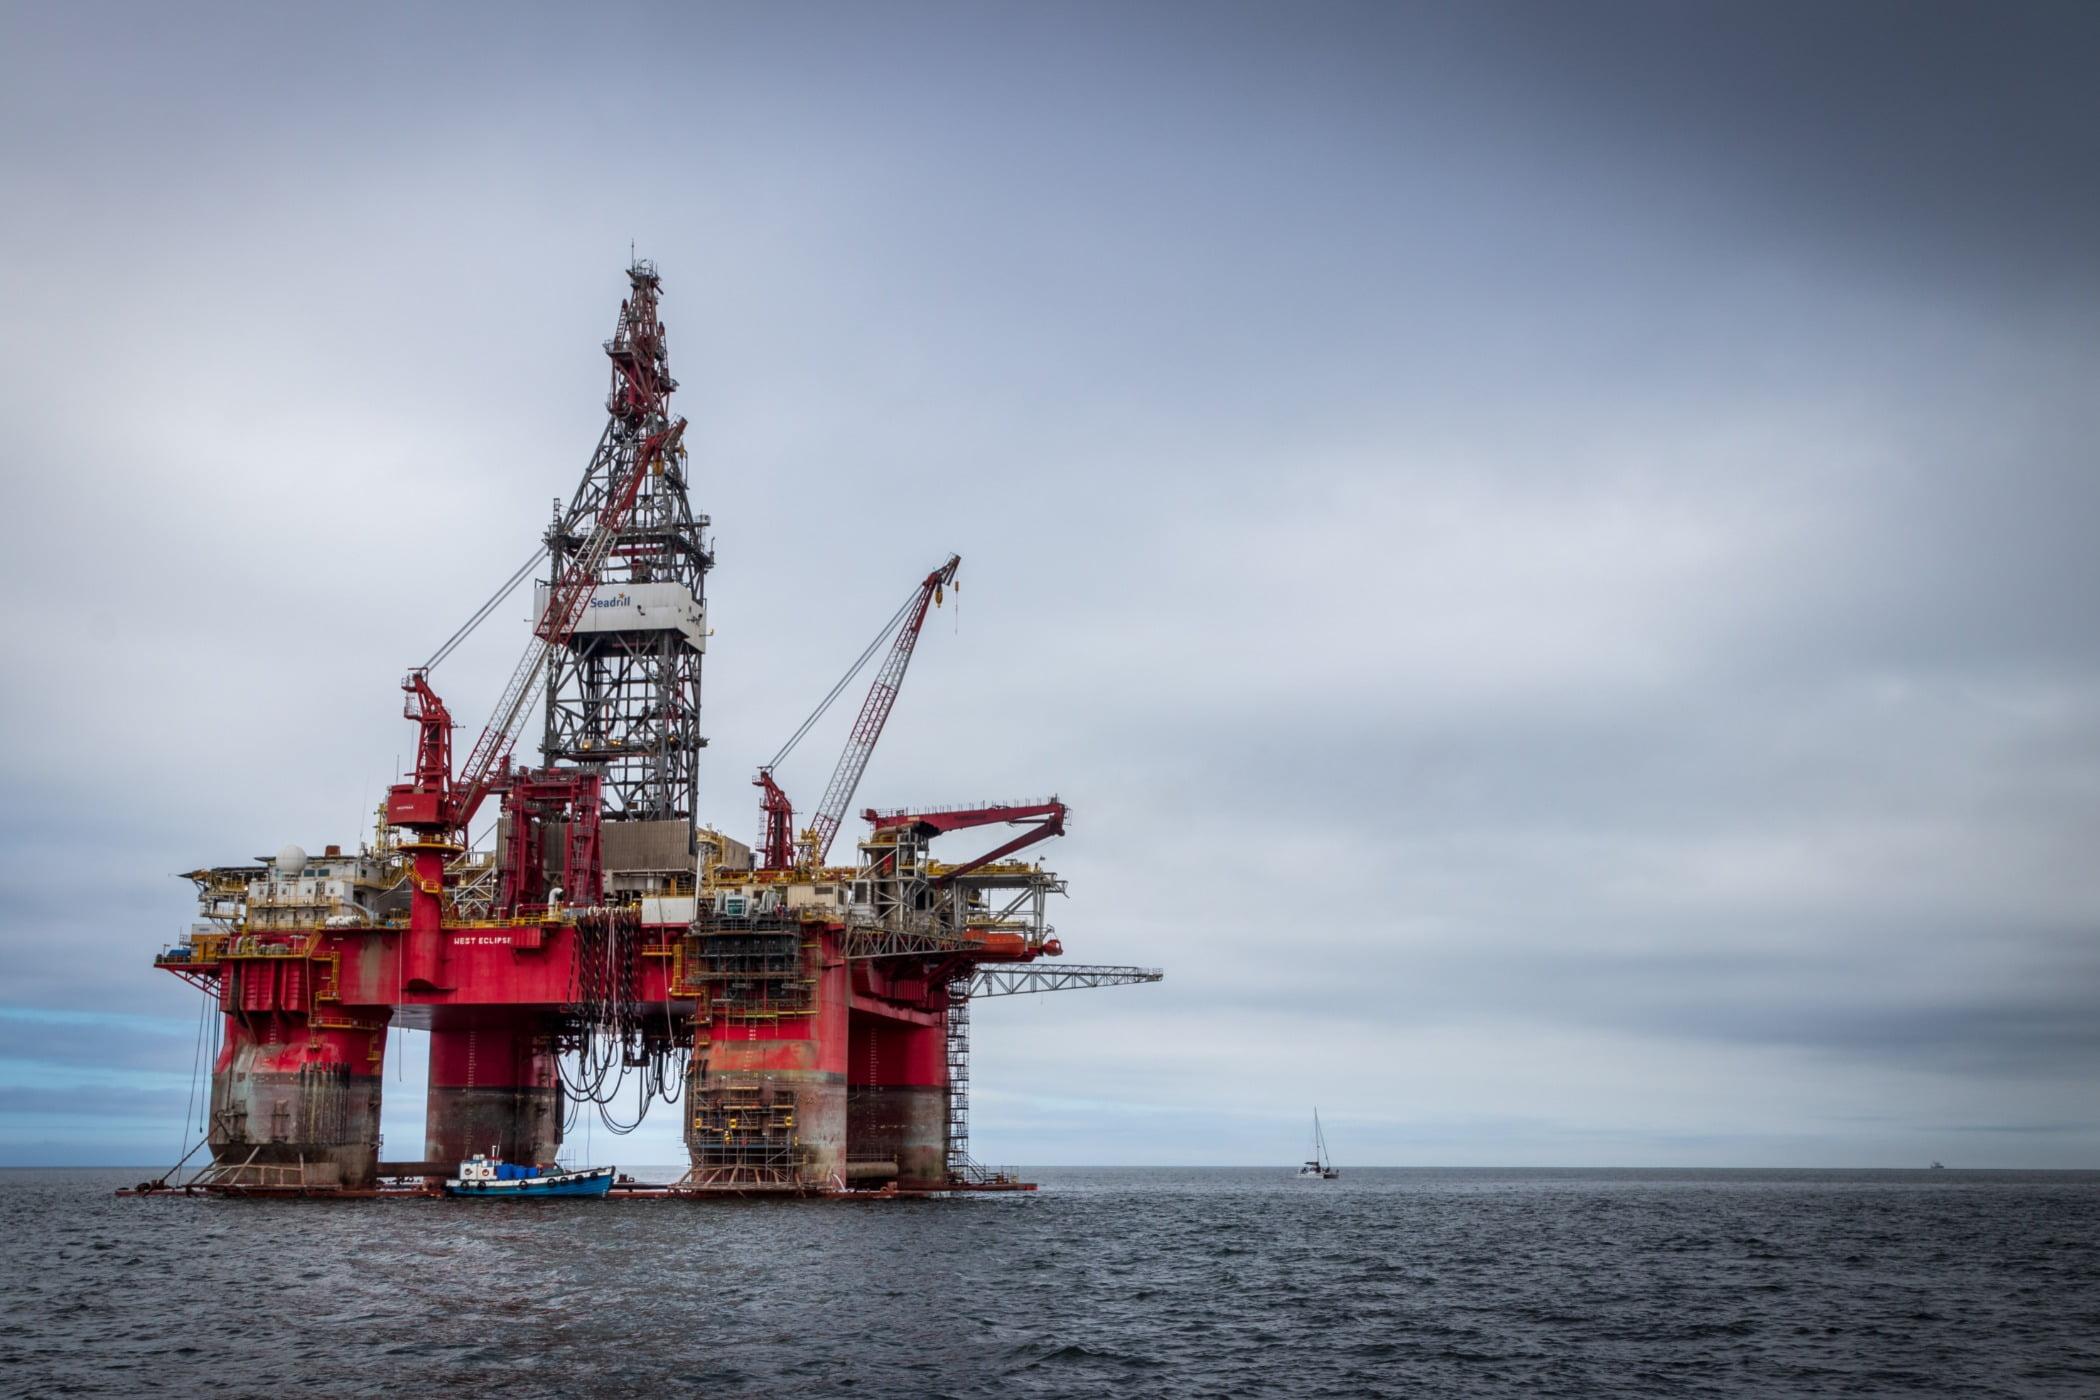 Offshore drilling, Water, Sky, Cloud, Semi-submersible, Lake